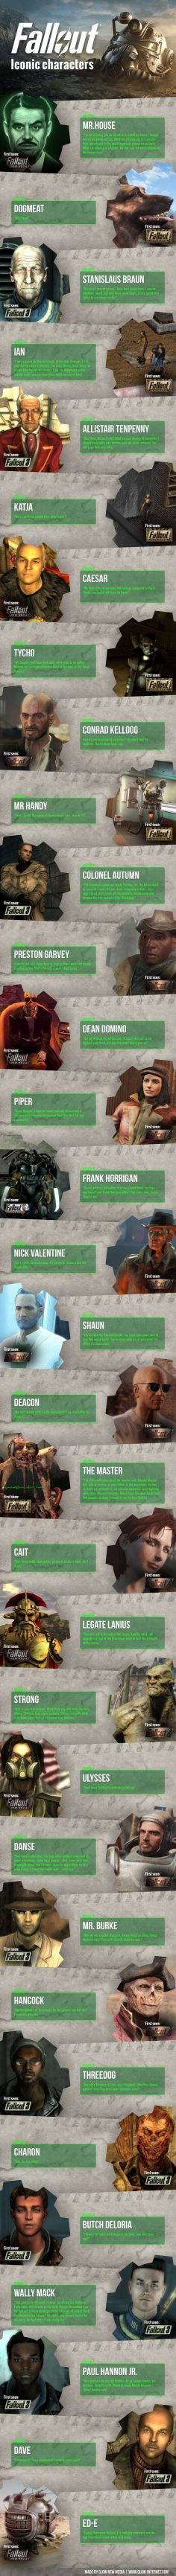 Fallout Iconic Characters  – nikiquentin57